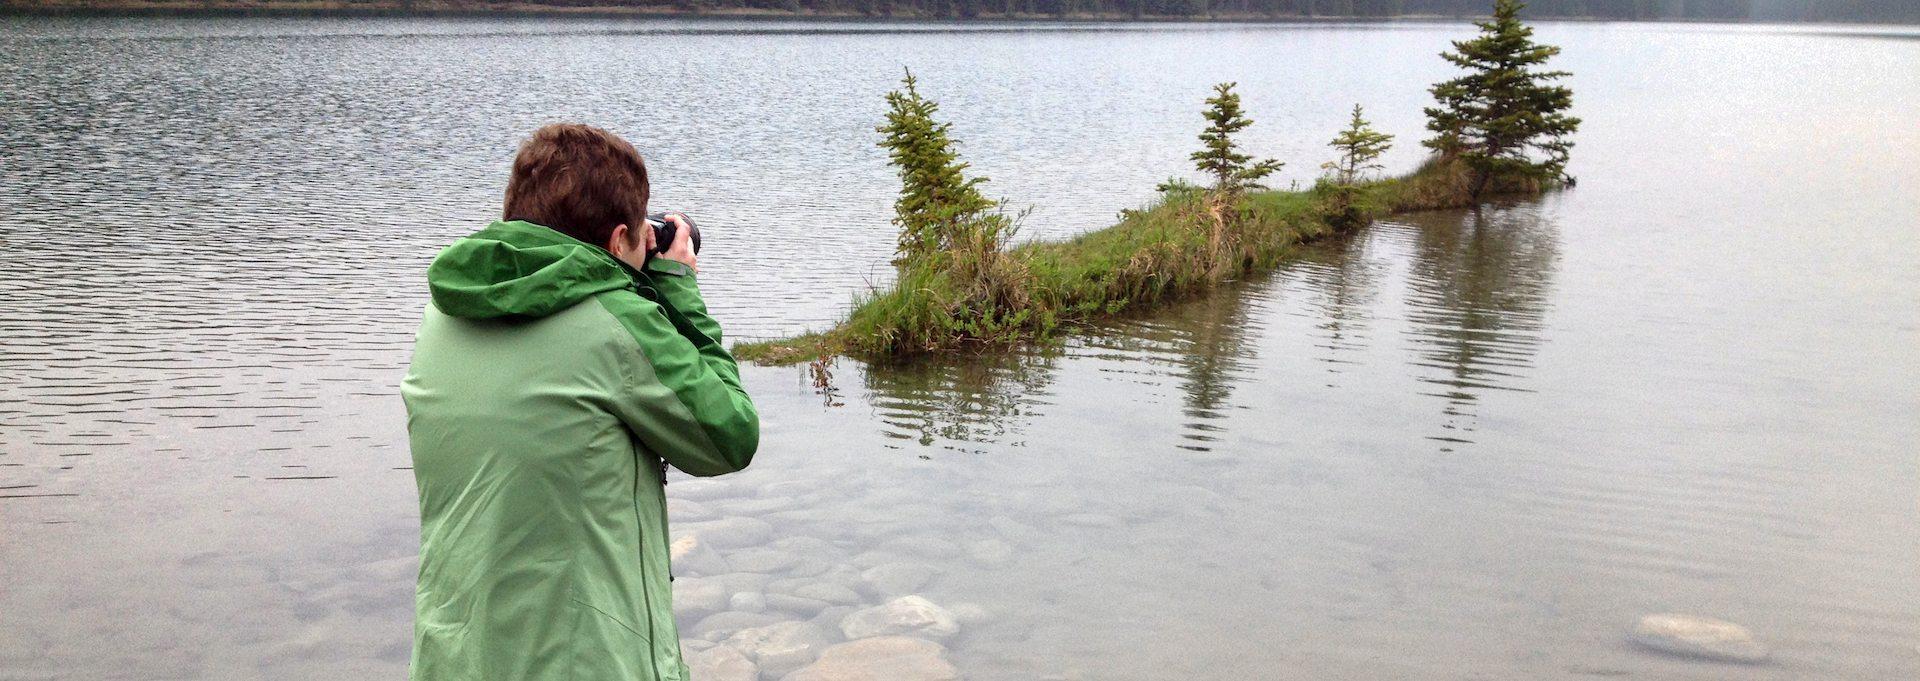 Banff Photography Tour, Discover Banff Tours